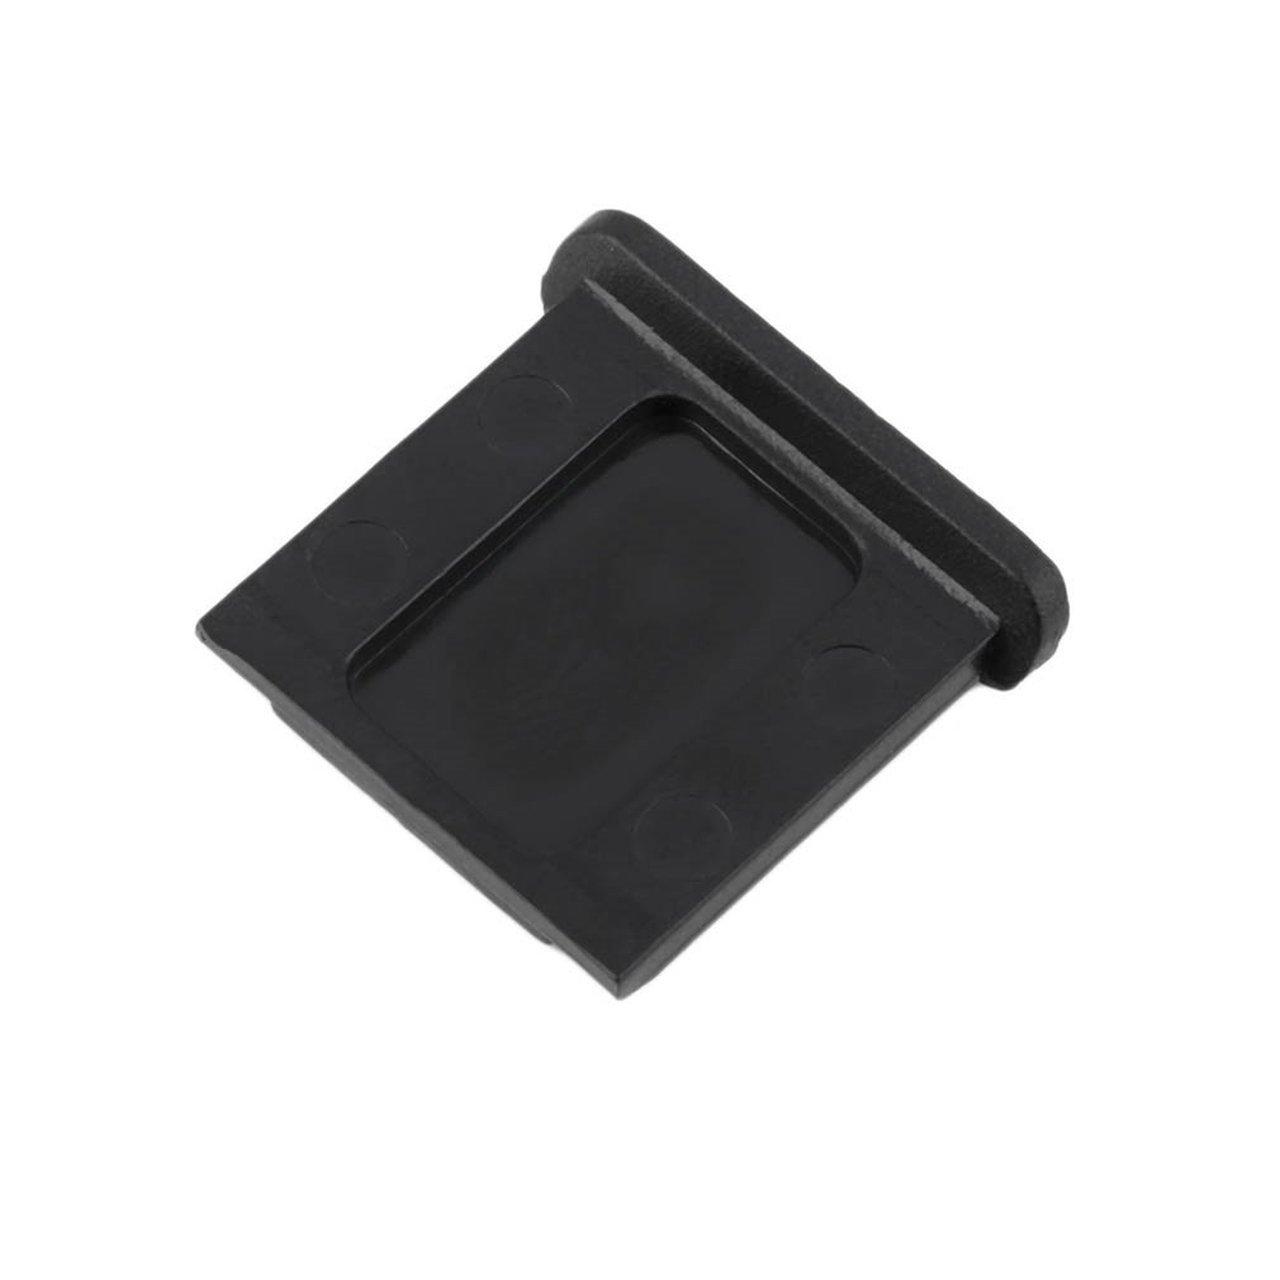 Flash Hot Shoe Cover Cap Protector para Nikon D90 D200 D300 BS-1 DSLR C/ámara Cubierta Protectora Accesorios para c/ámaras Digitales ESjasnyfall Negro